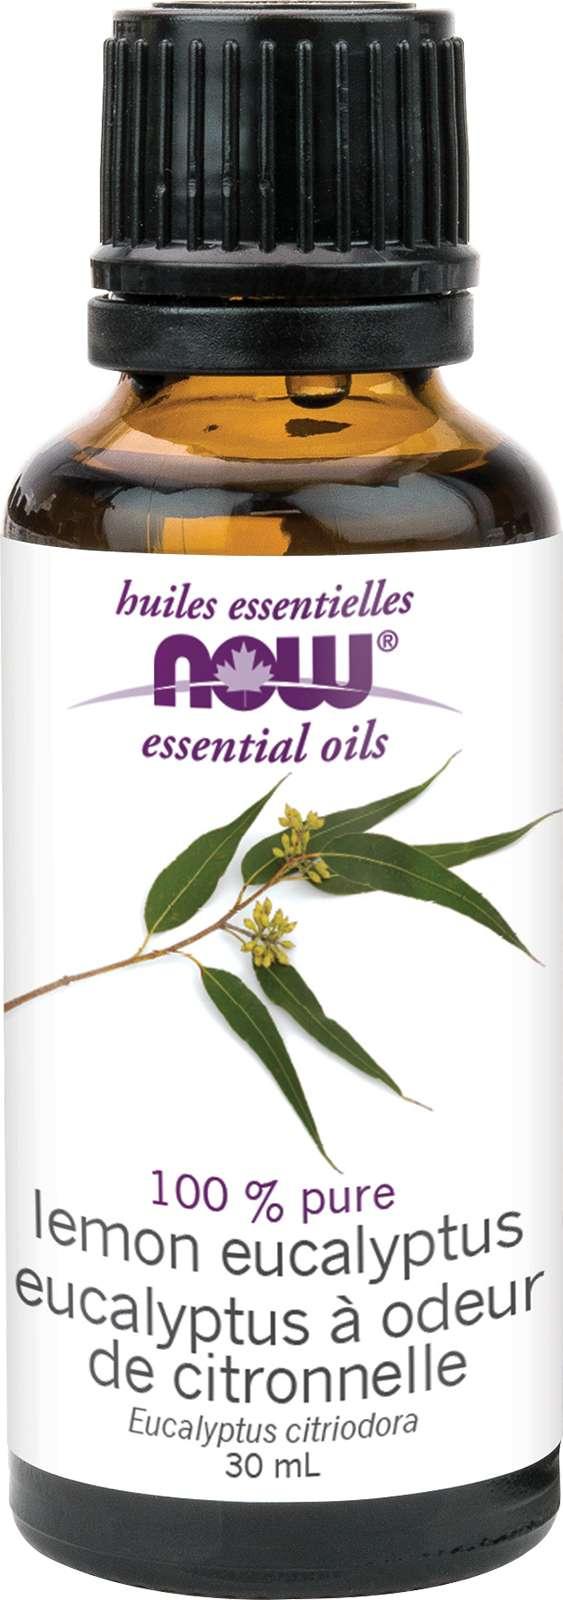 Lemon Eucalyptus Oil (Eucalyptus citriodora) 30mL